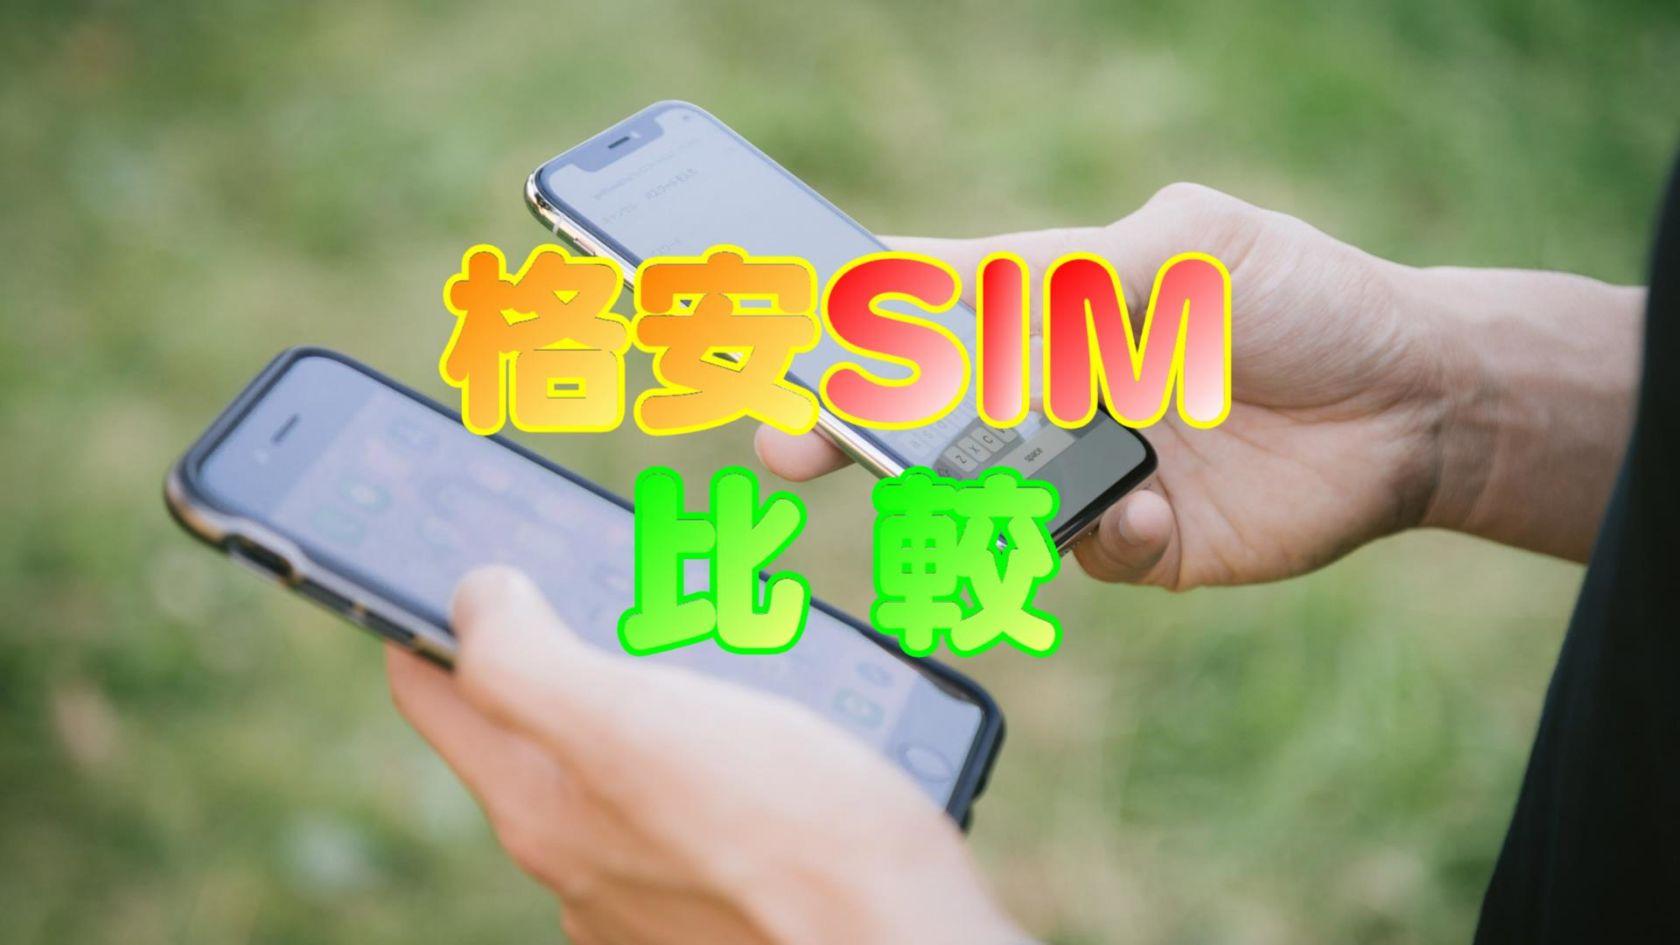 格安SIM 比較